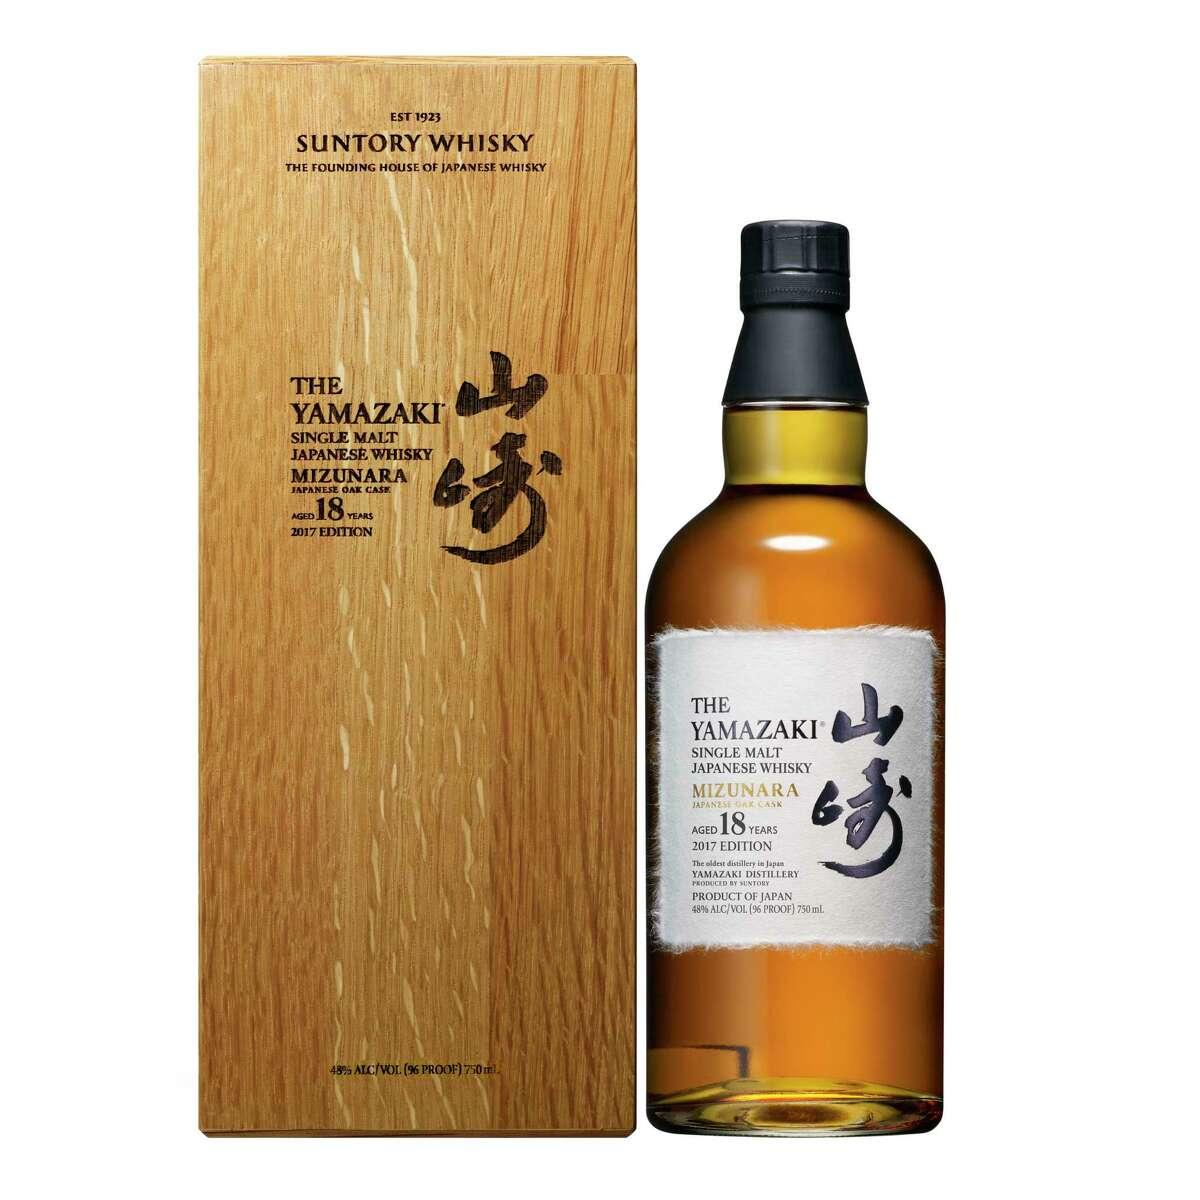 The House of Suntory Whisky has introduced Yamazaki Mizunara 2017 Edition, a limited-edition whisky aged for 18 years in rare Japanese Mizunara oak.